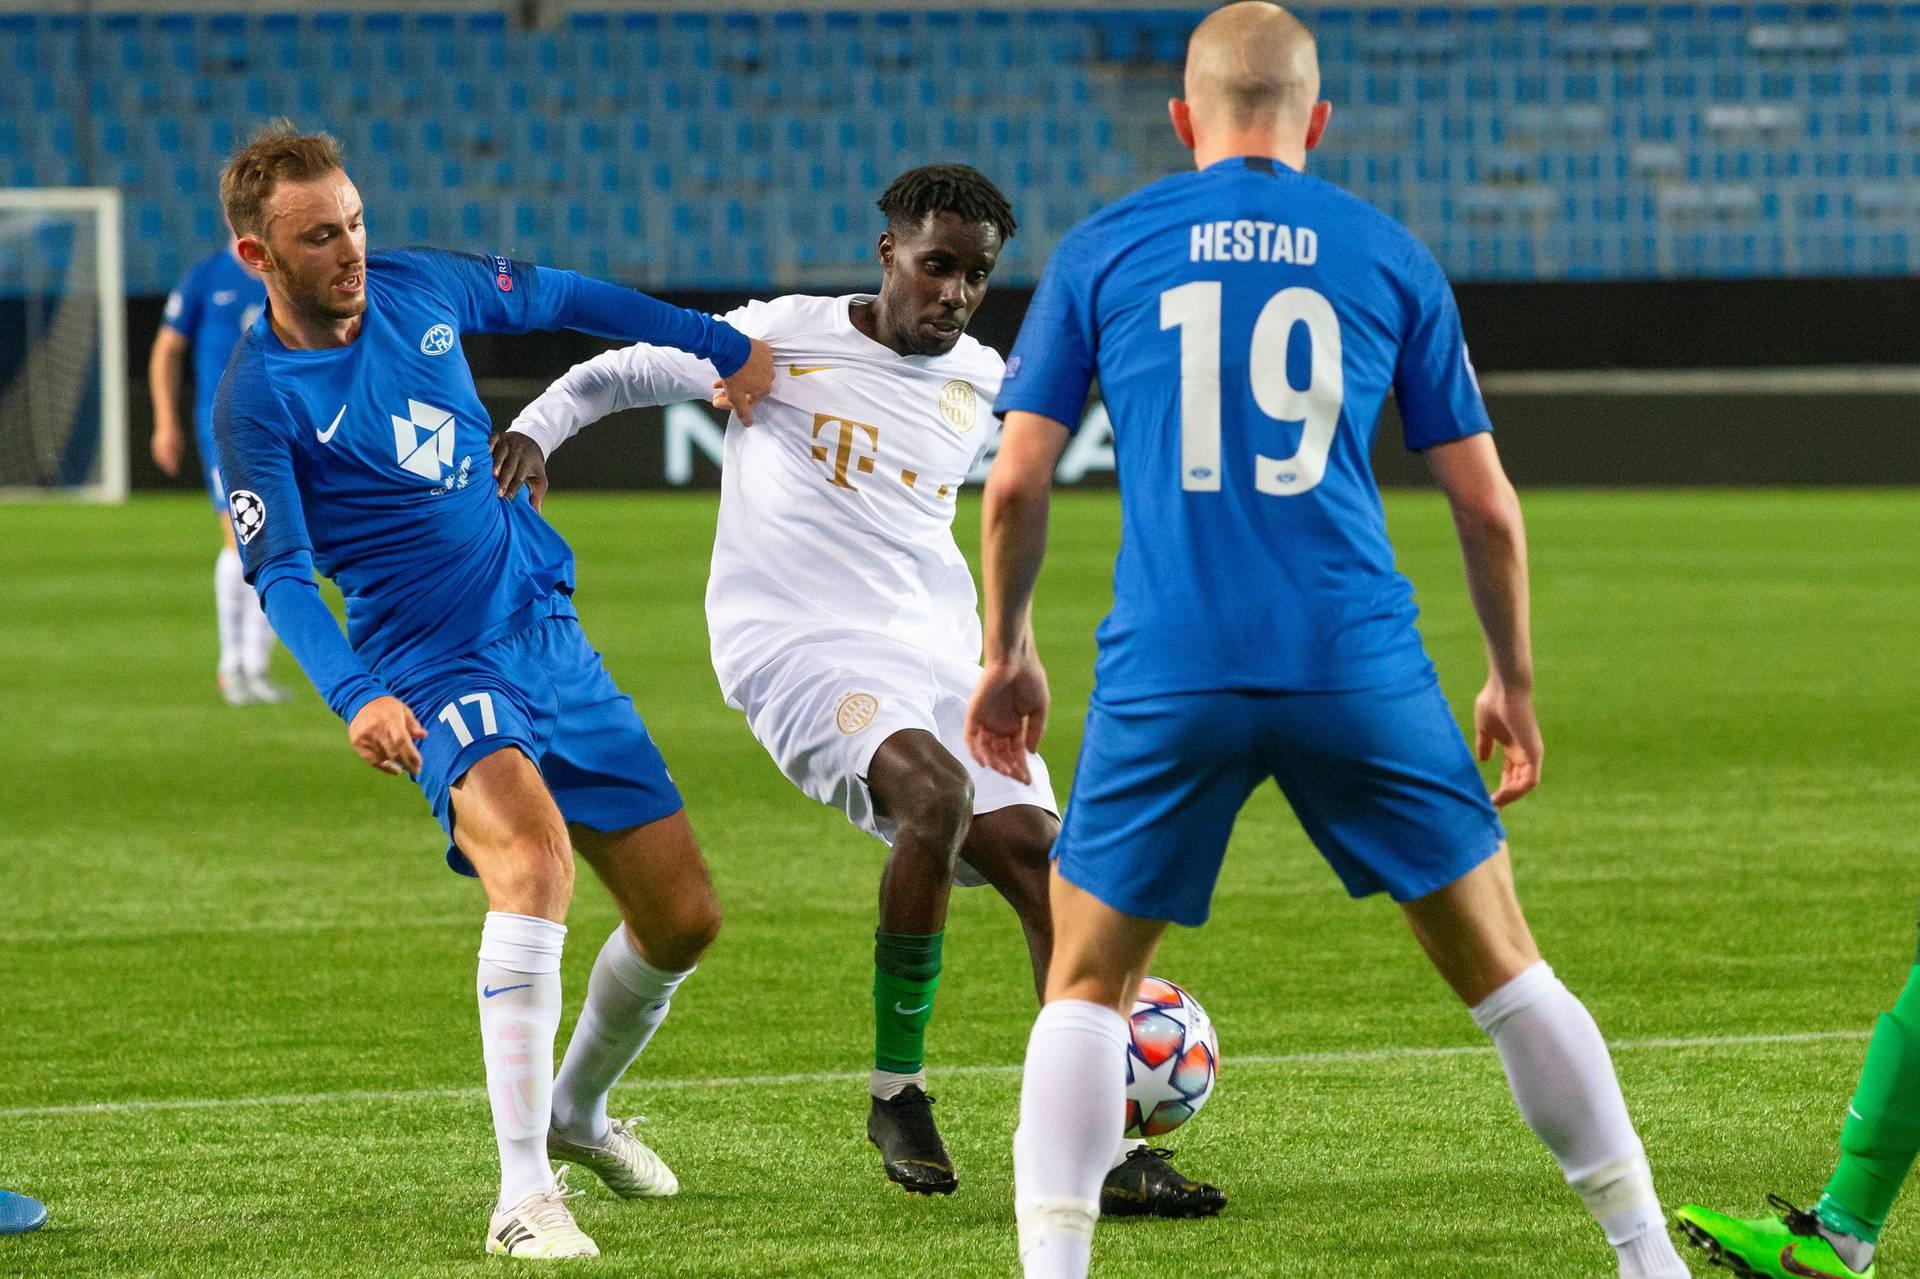 Champions League - Play-off - First Leg - Molde v Ferencvaros